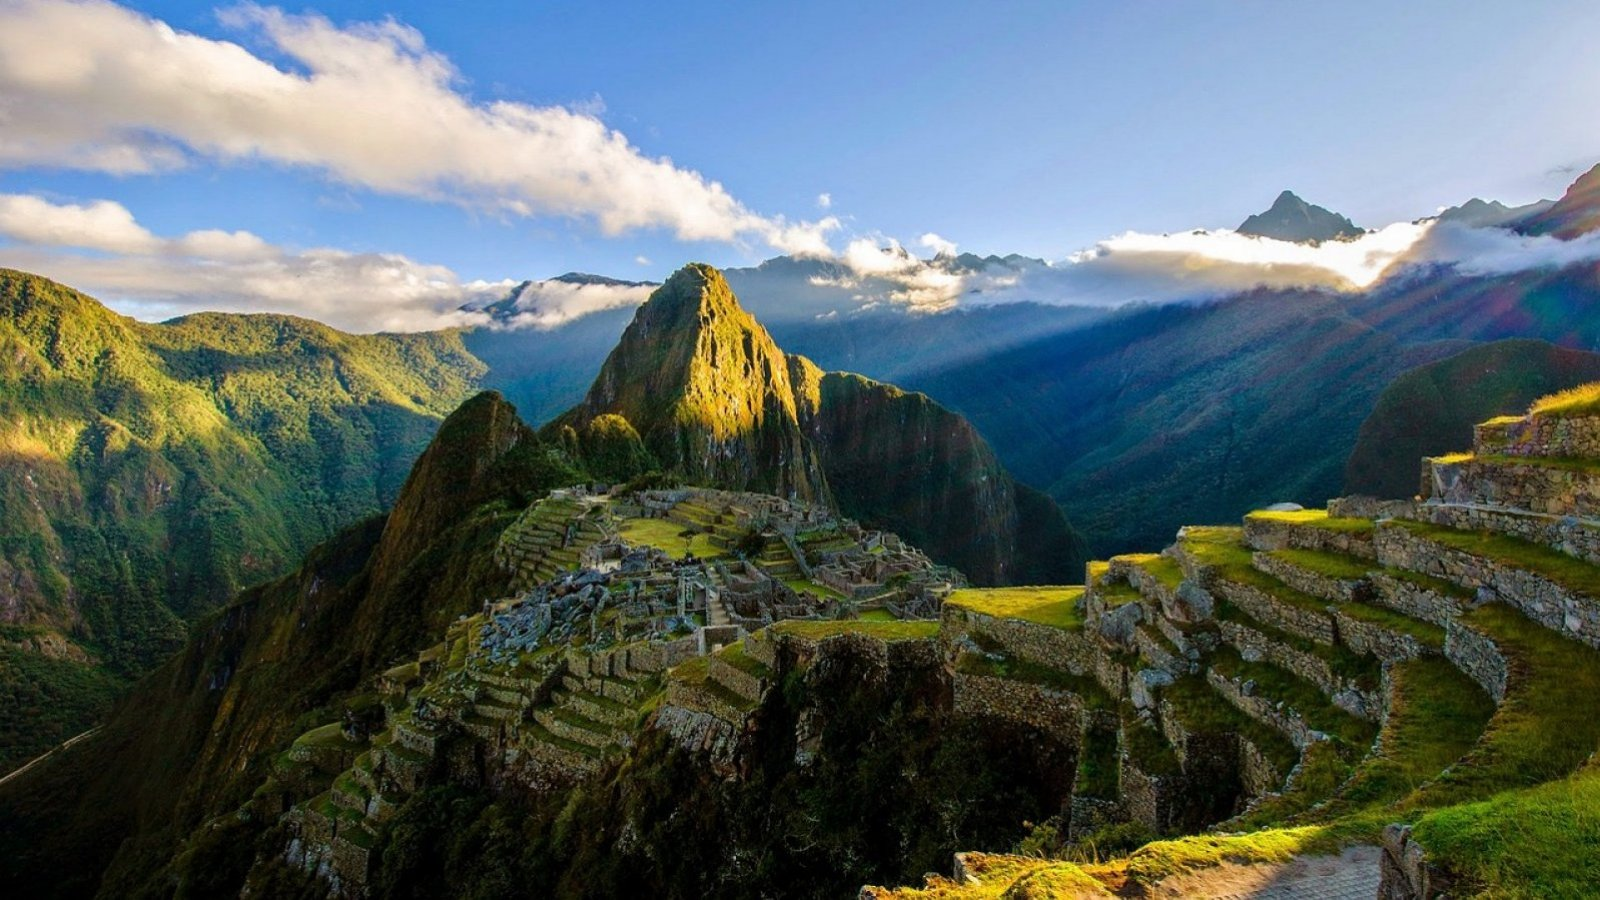 Vistas del Machu Picchu, en Perú.